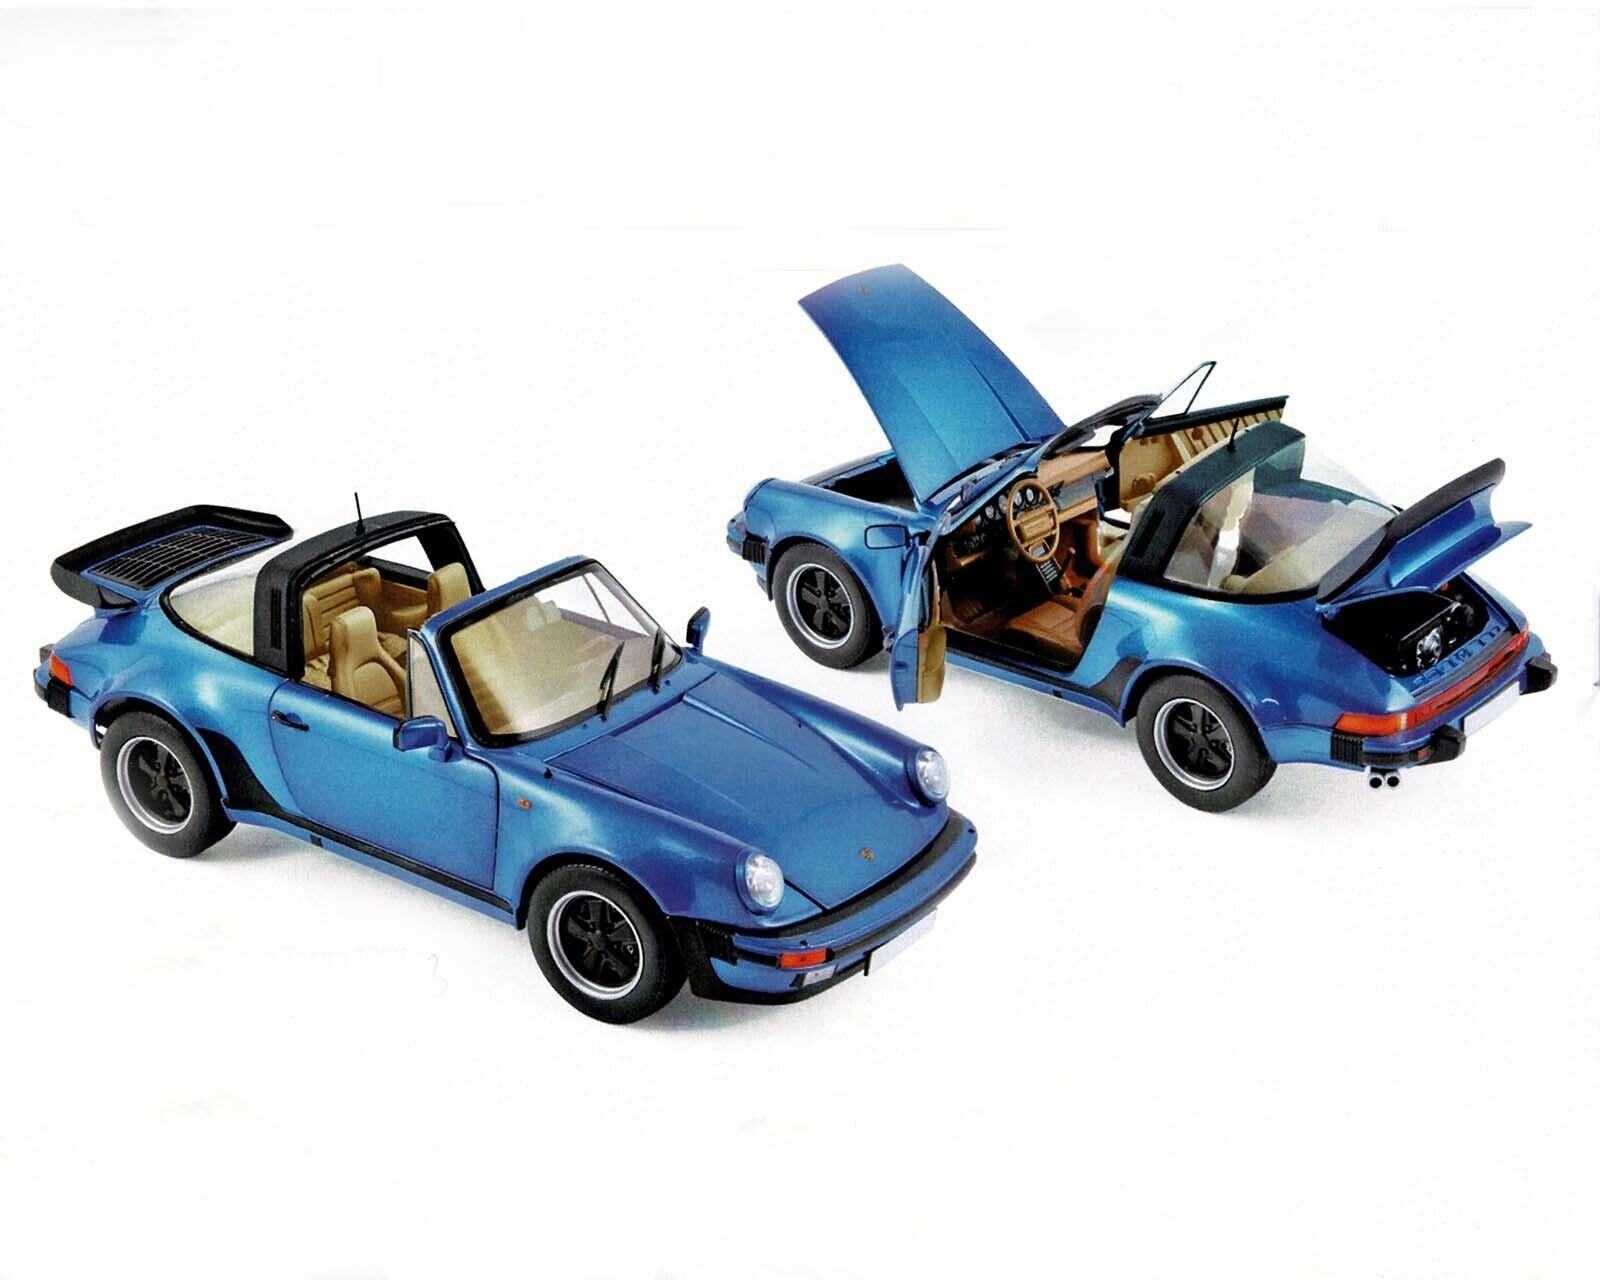 precios razonables Porsche 911 Targa 3,3 - Azul Azul Azul Metálico, 1987 , Norev 1 18  barato y de alta calidad